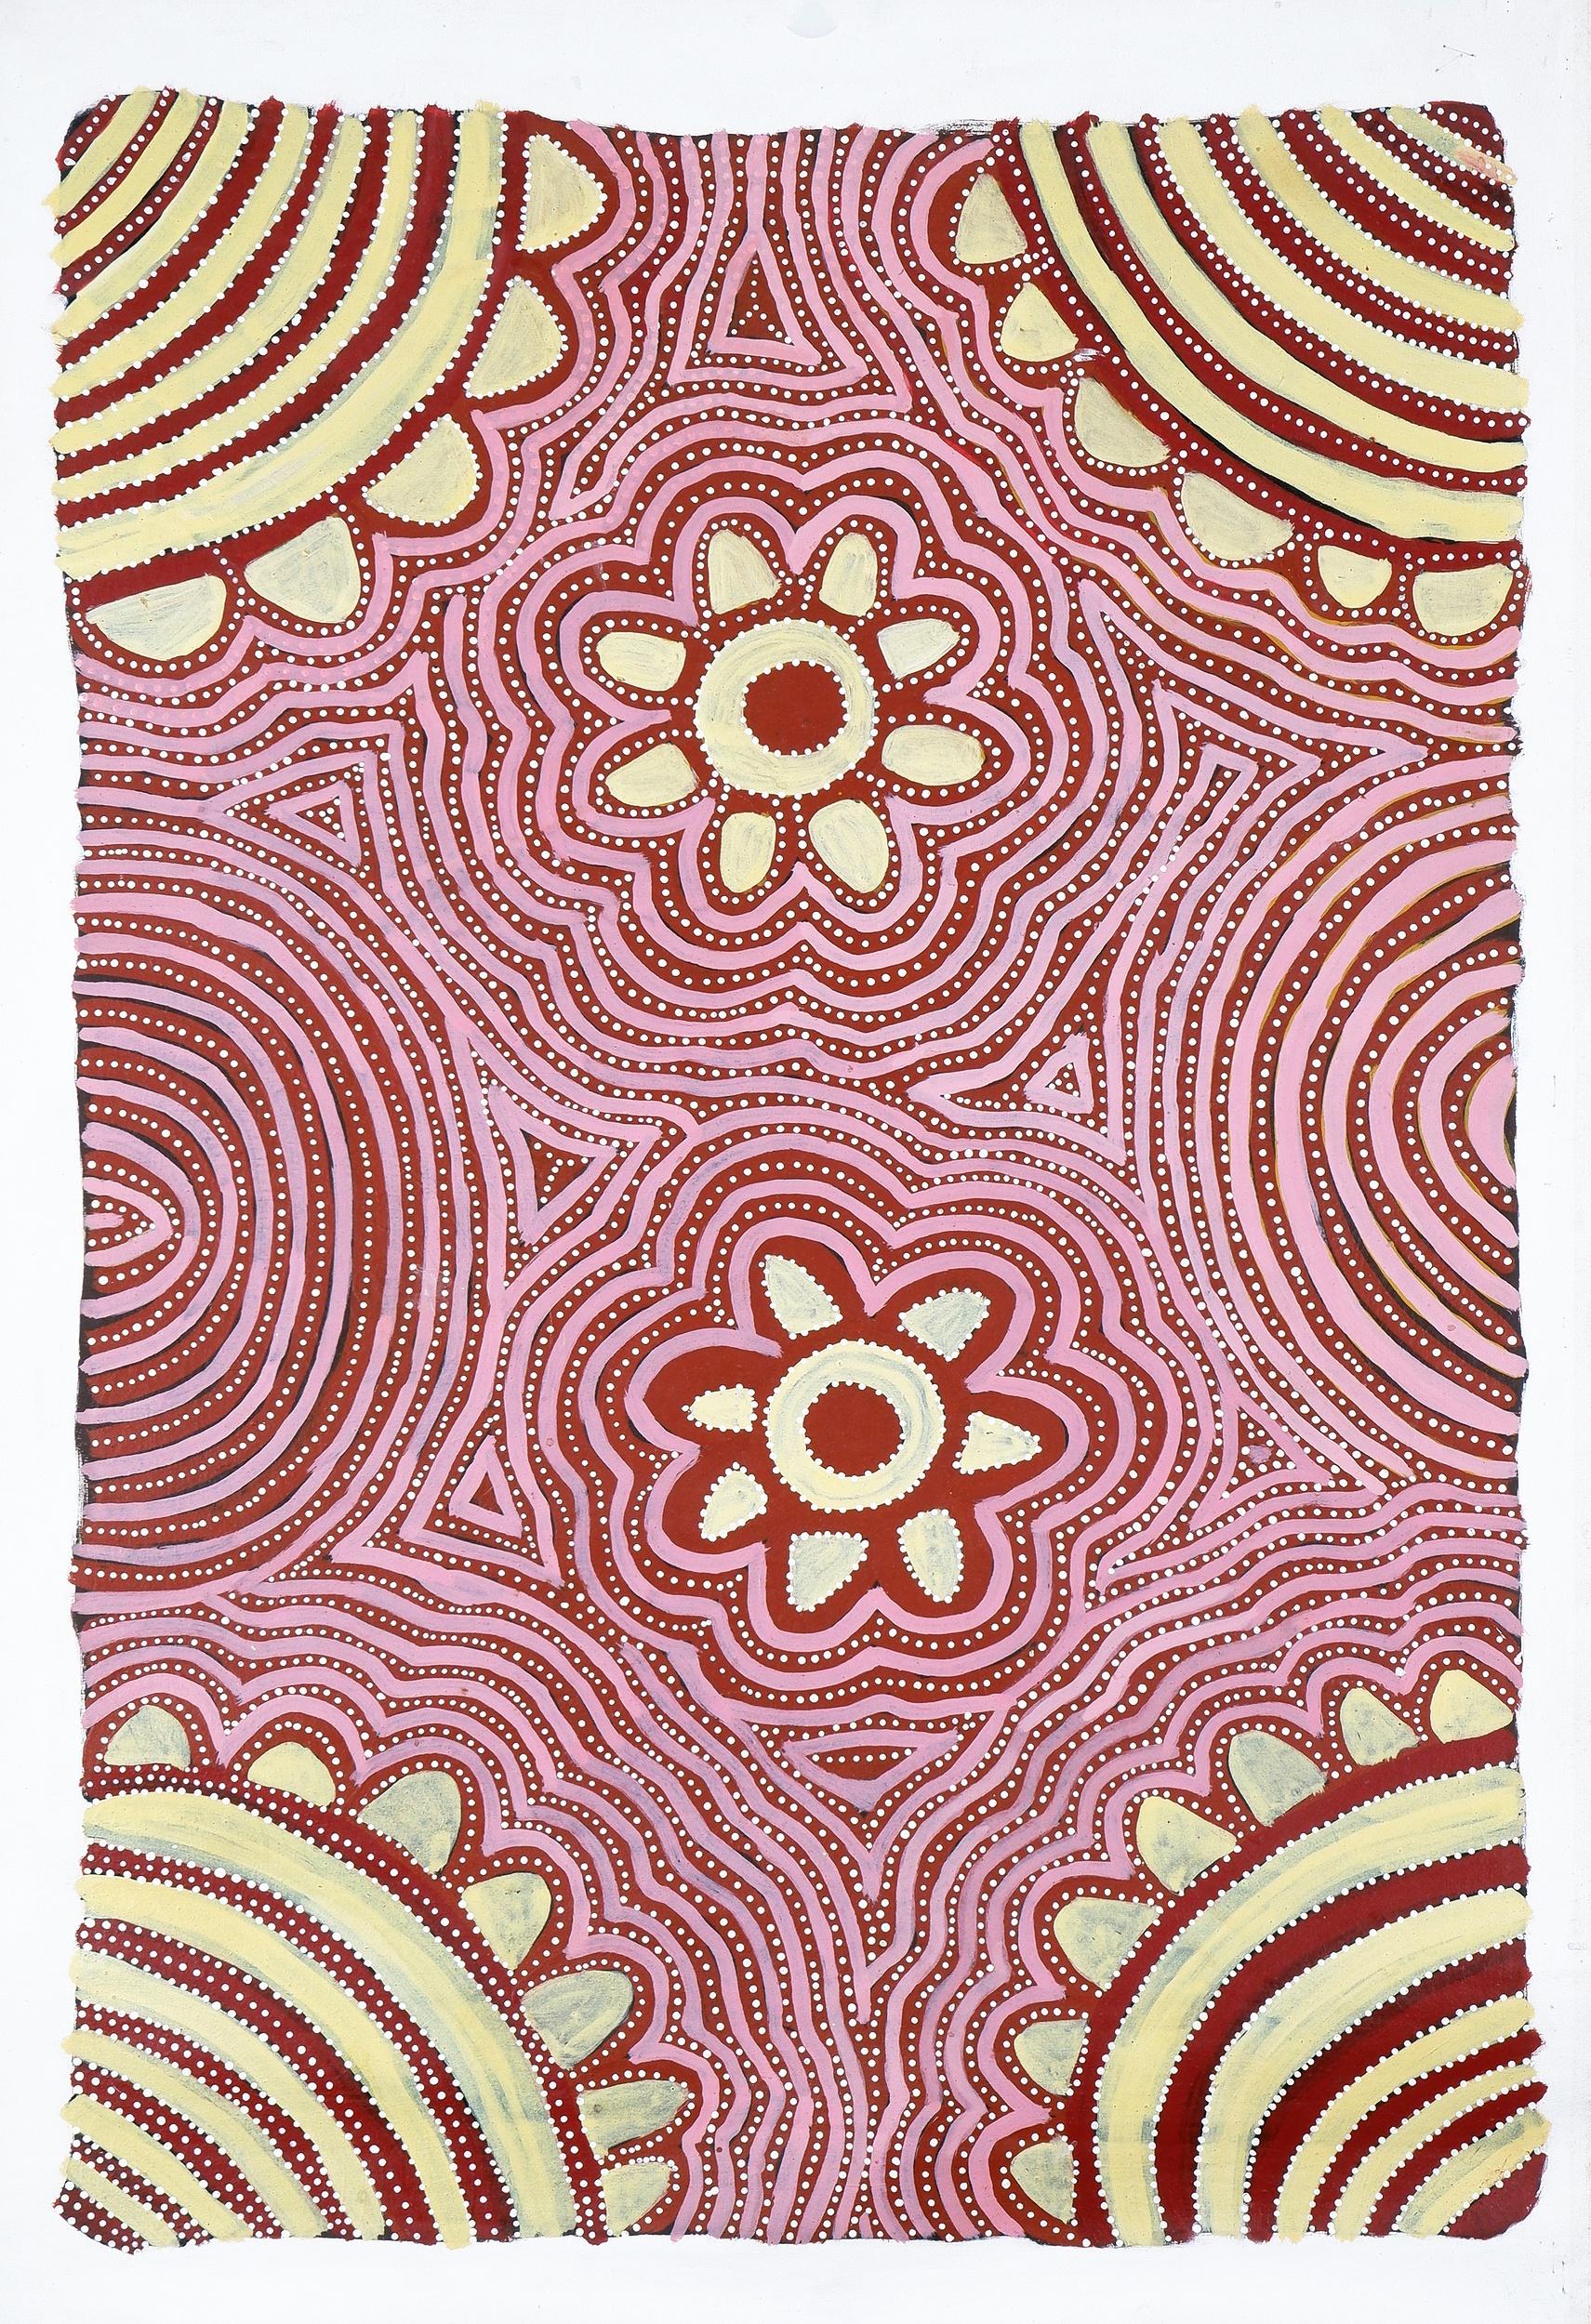 'Audrey Kngwarreye (born c1945, Alyawarre language group), Awelye 1996, Synthetic Polymer Paint on Canvas, 57 x 85 cm'